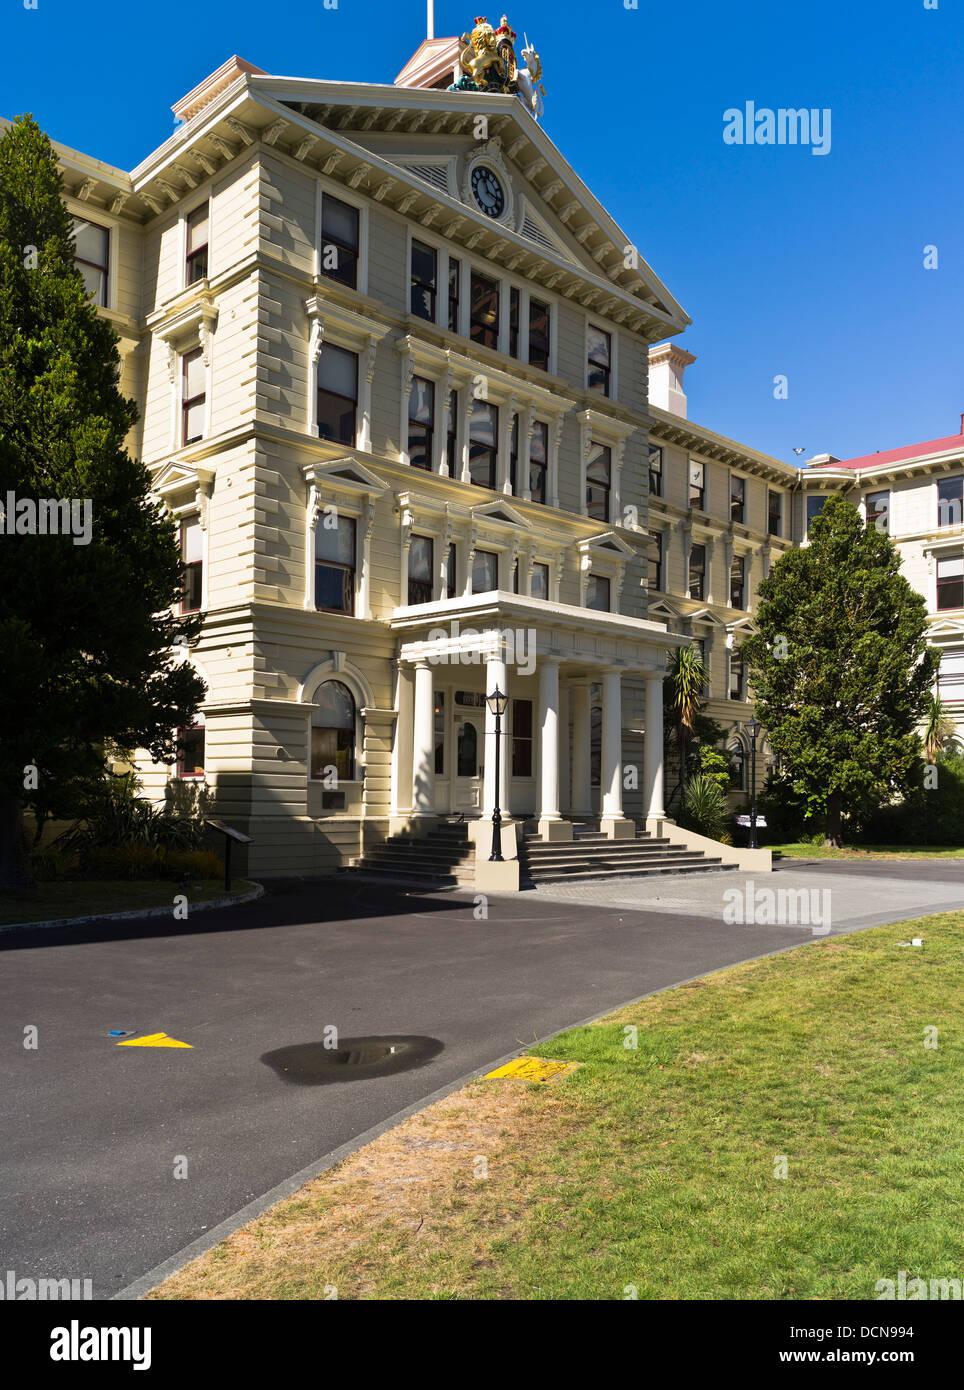 Dh Law School Wellington New Zealand Victoria University Law Faculty